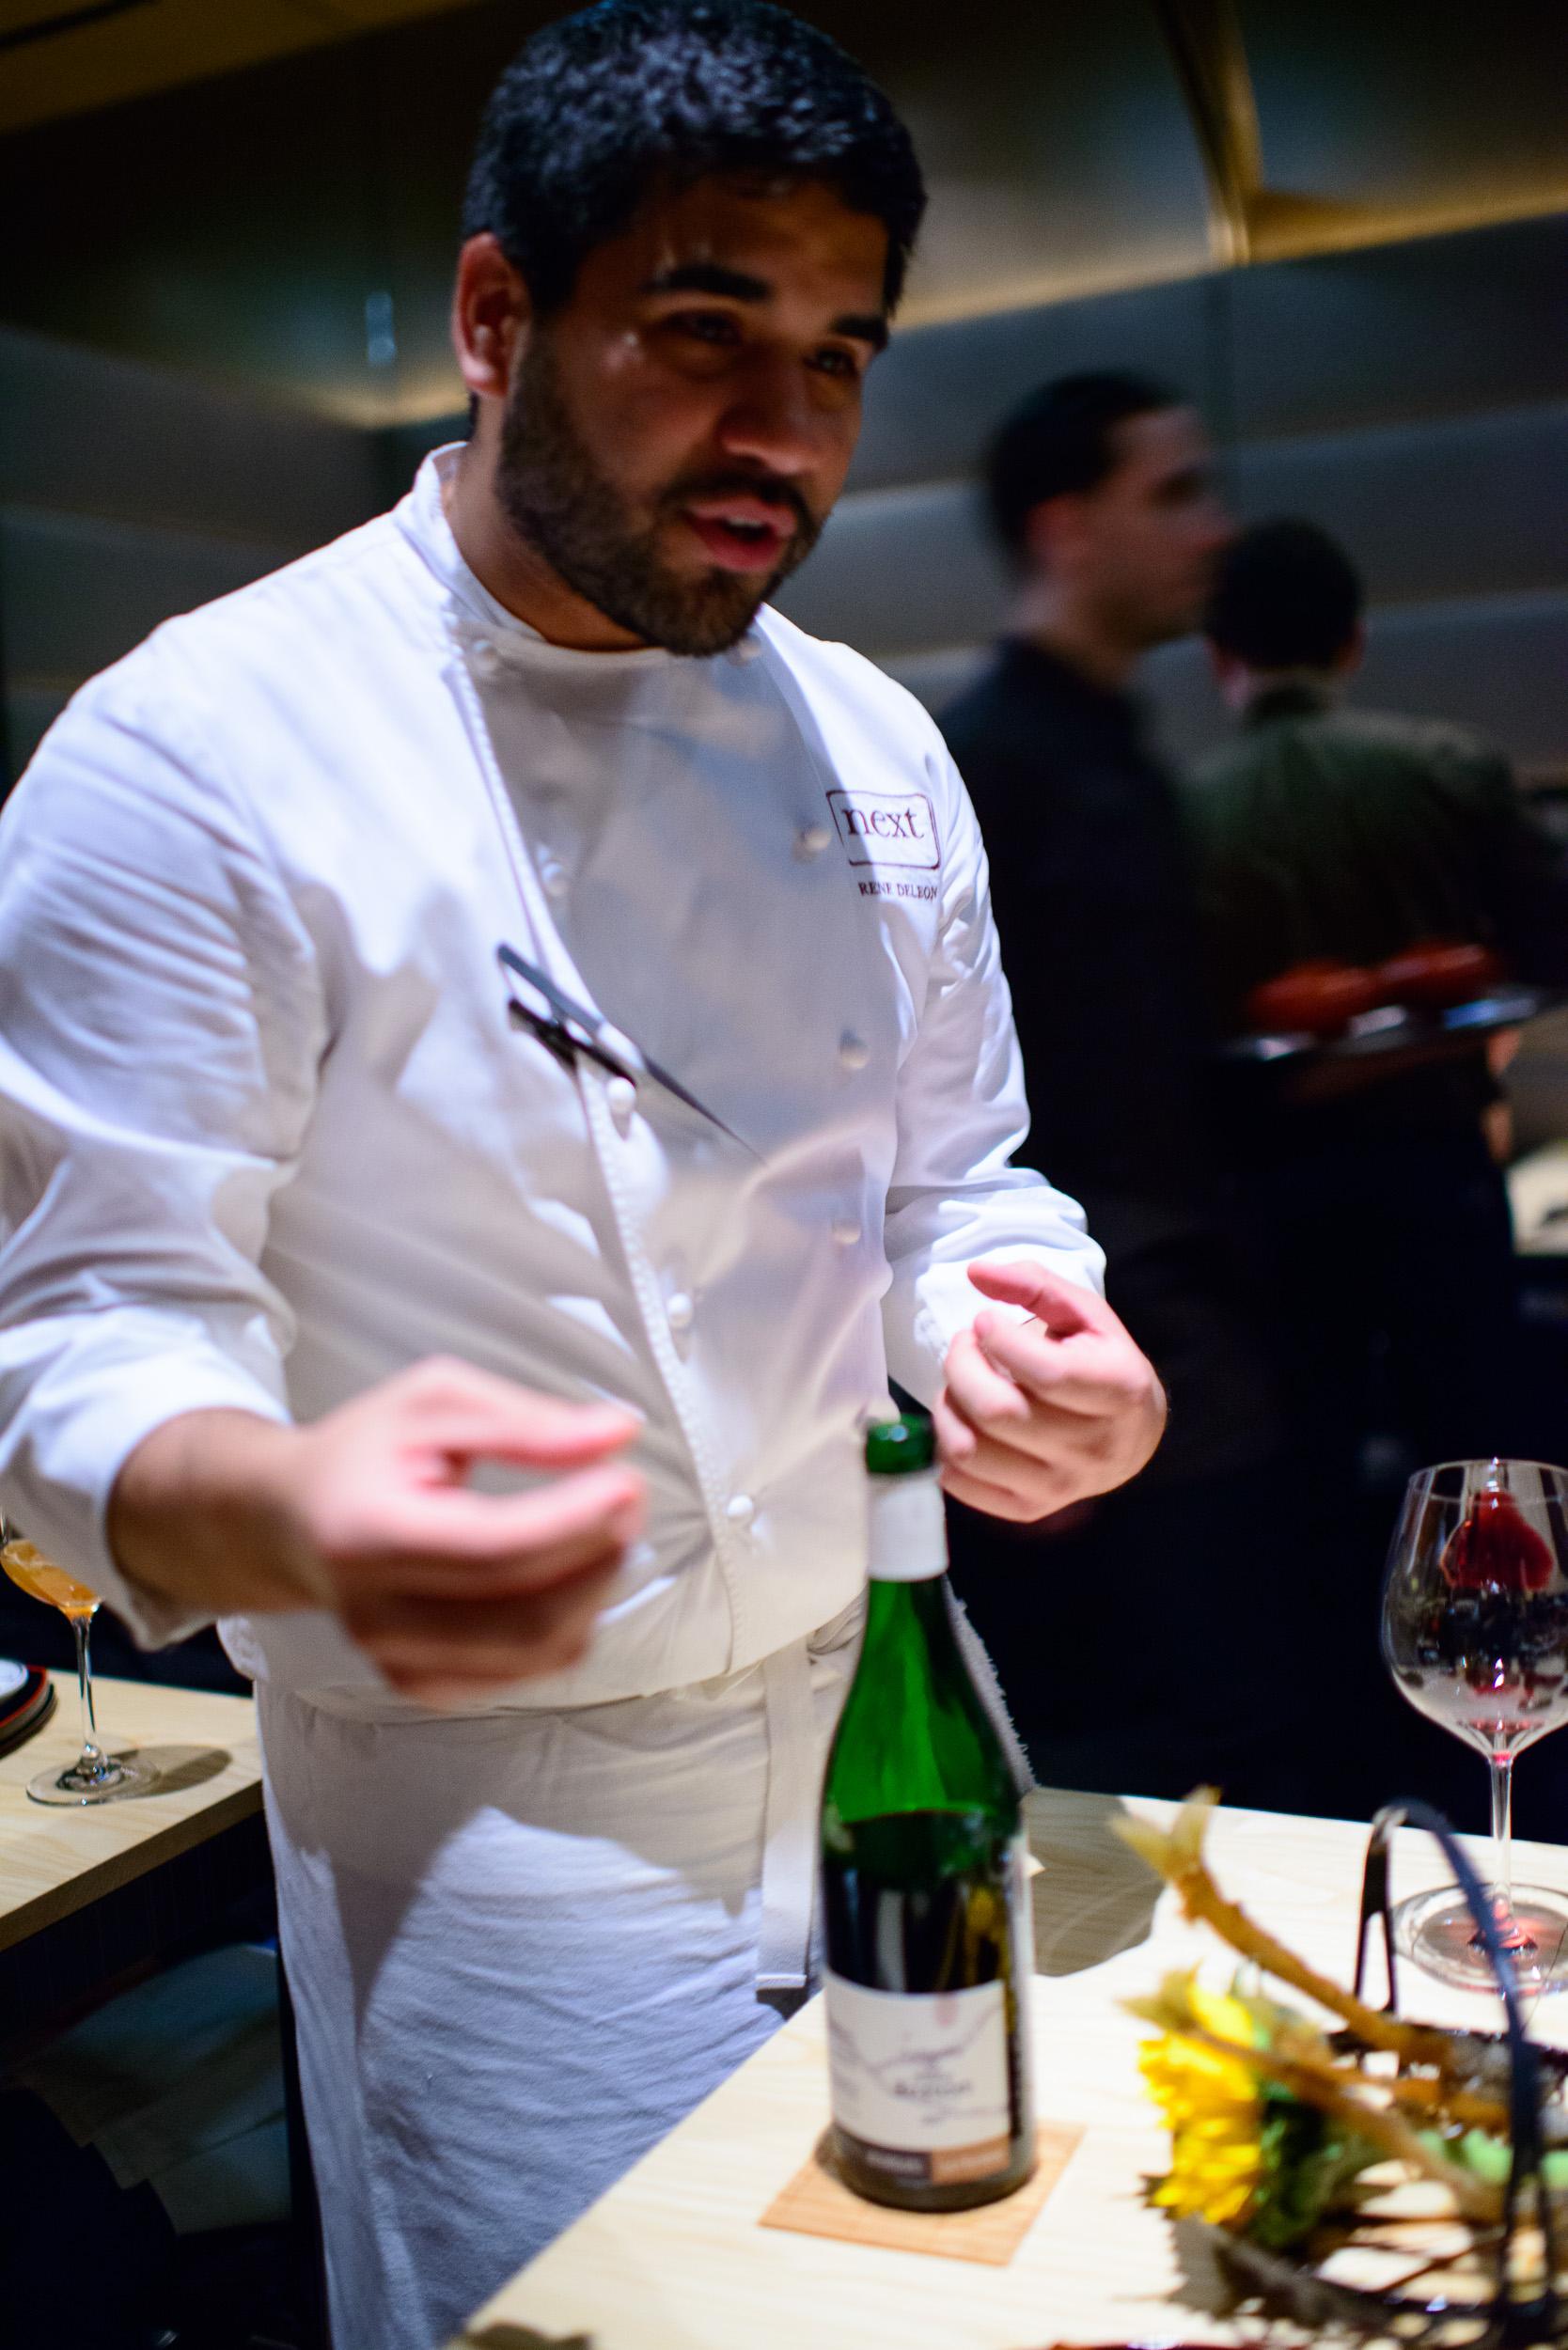 Chef Rene Deleon